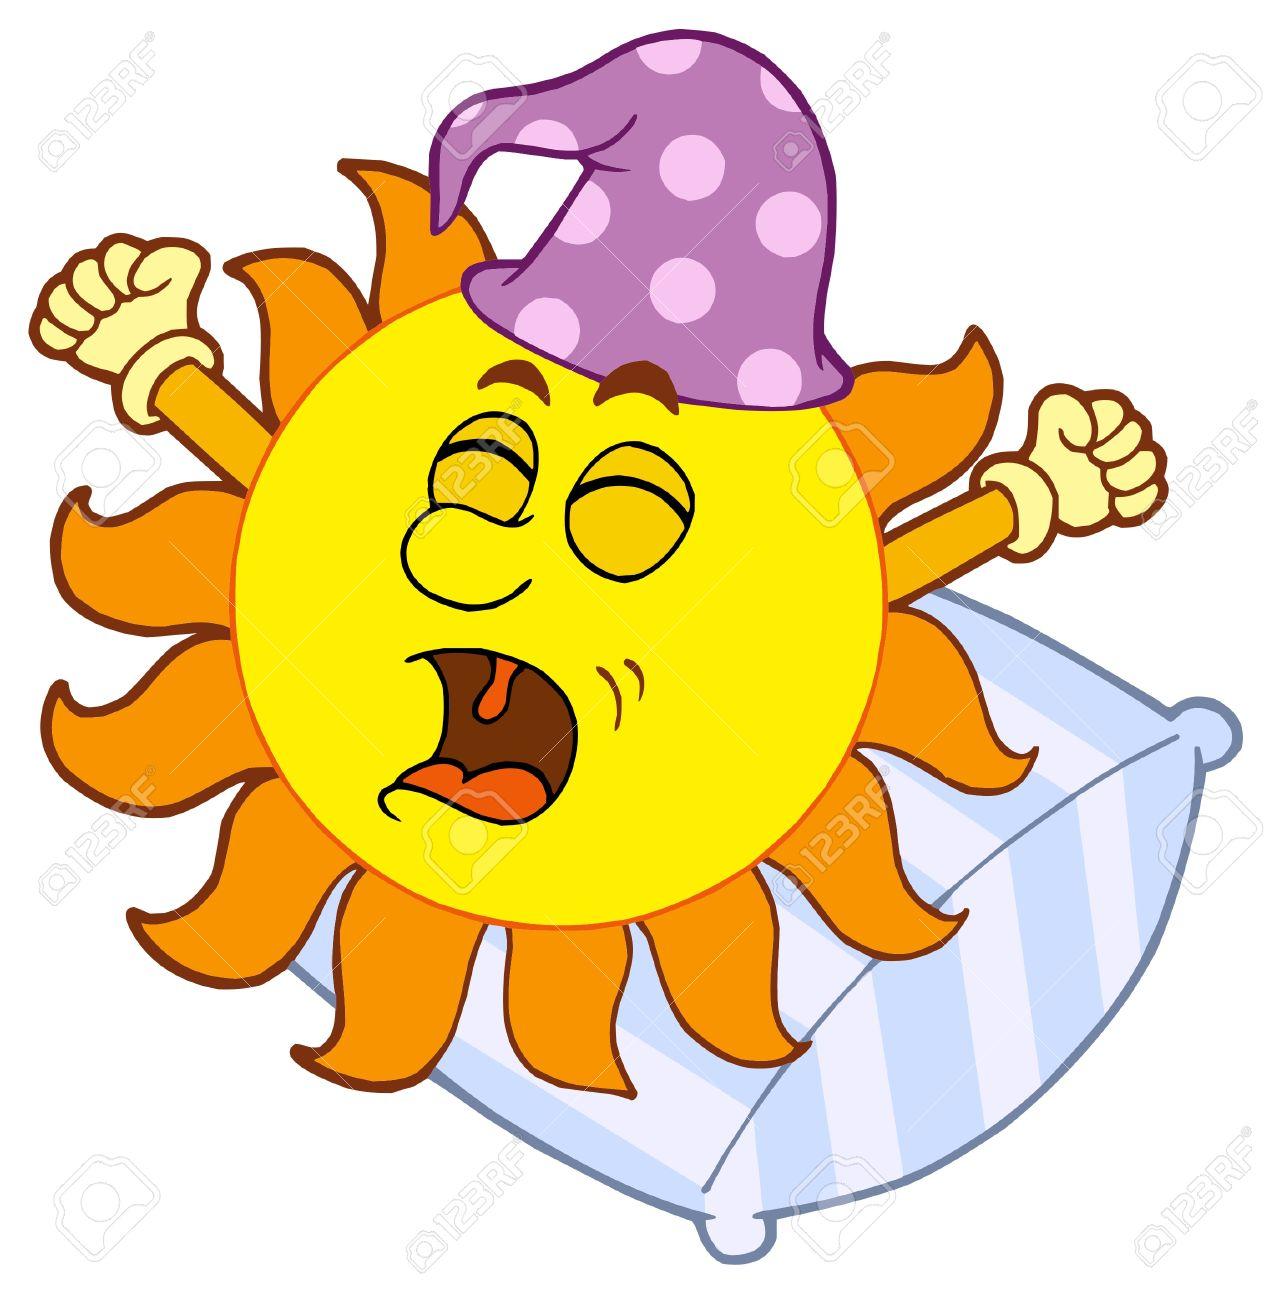 waking up sun vector illustration royalty free cliparts vectors rh 123rf com wake up call clipart wake up early clipart